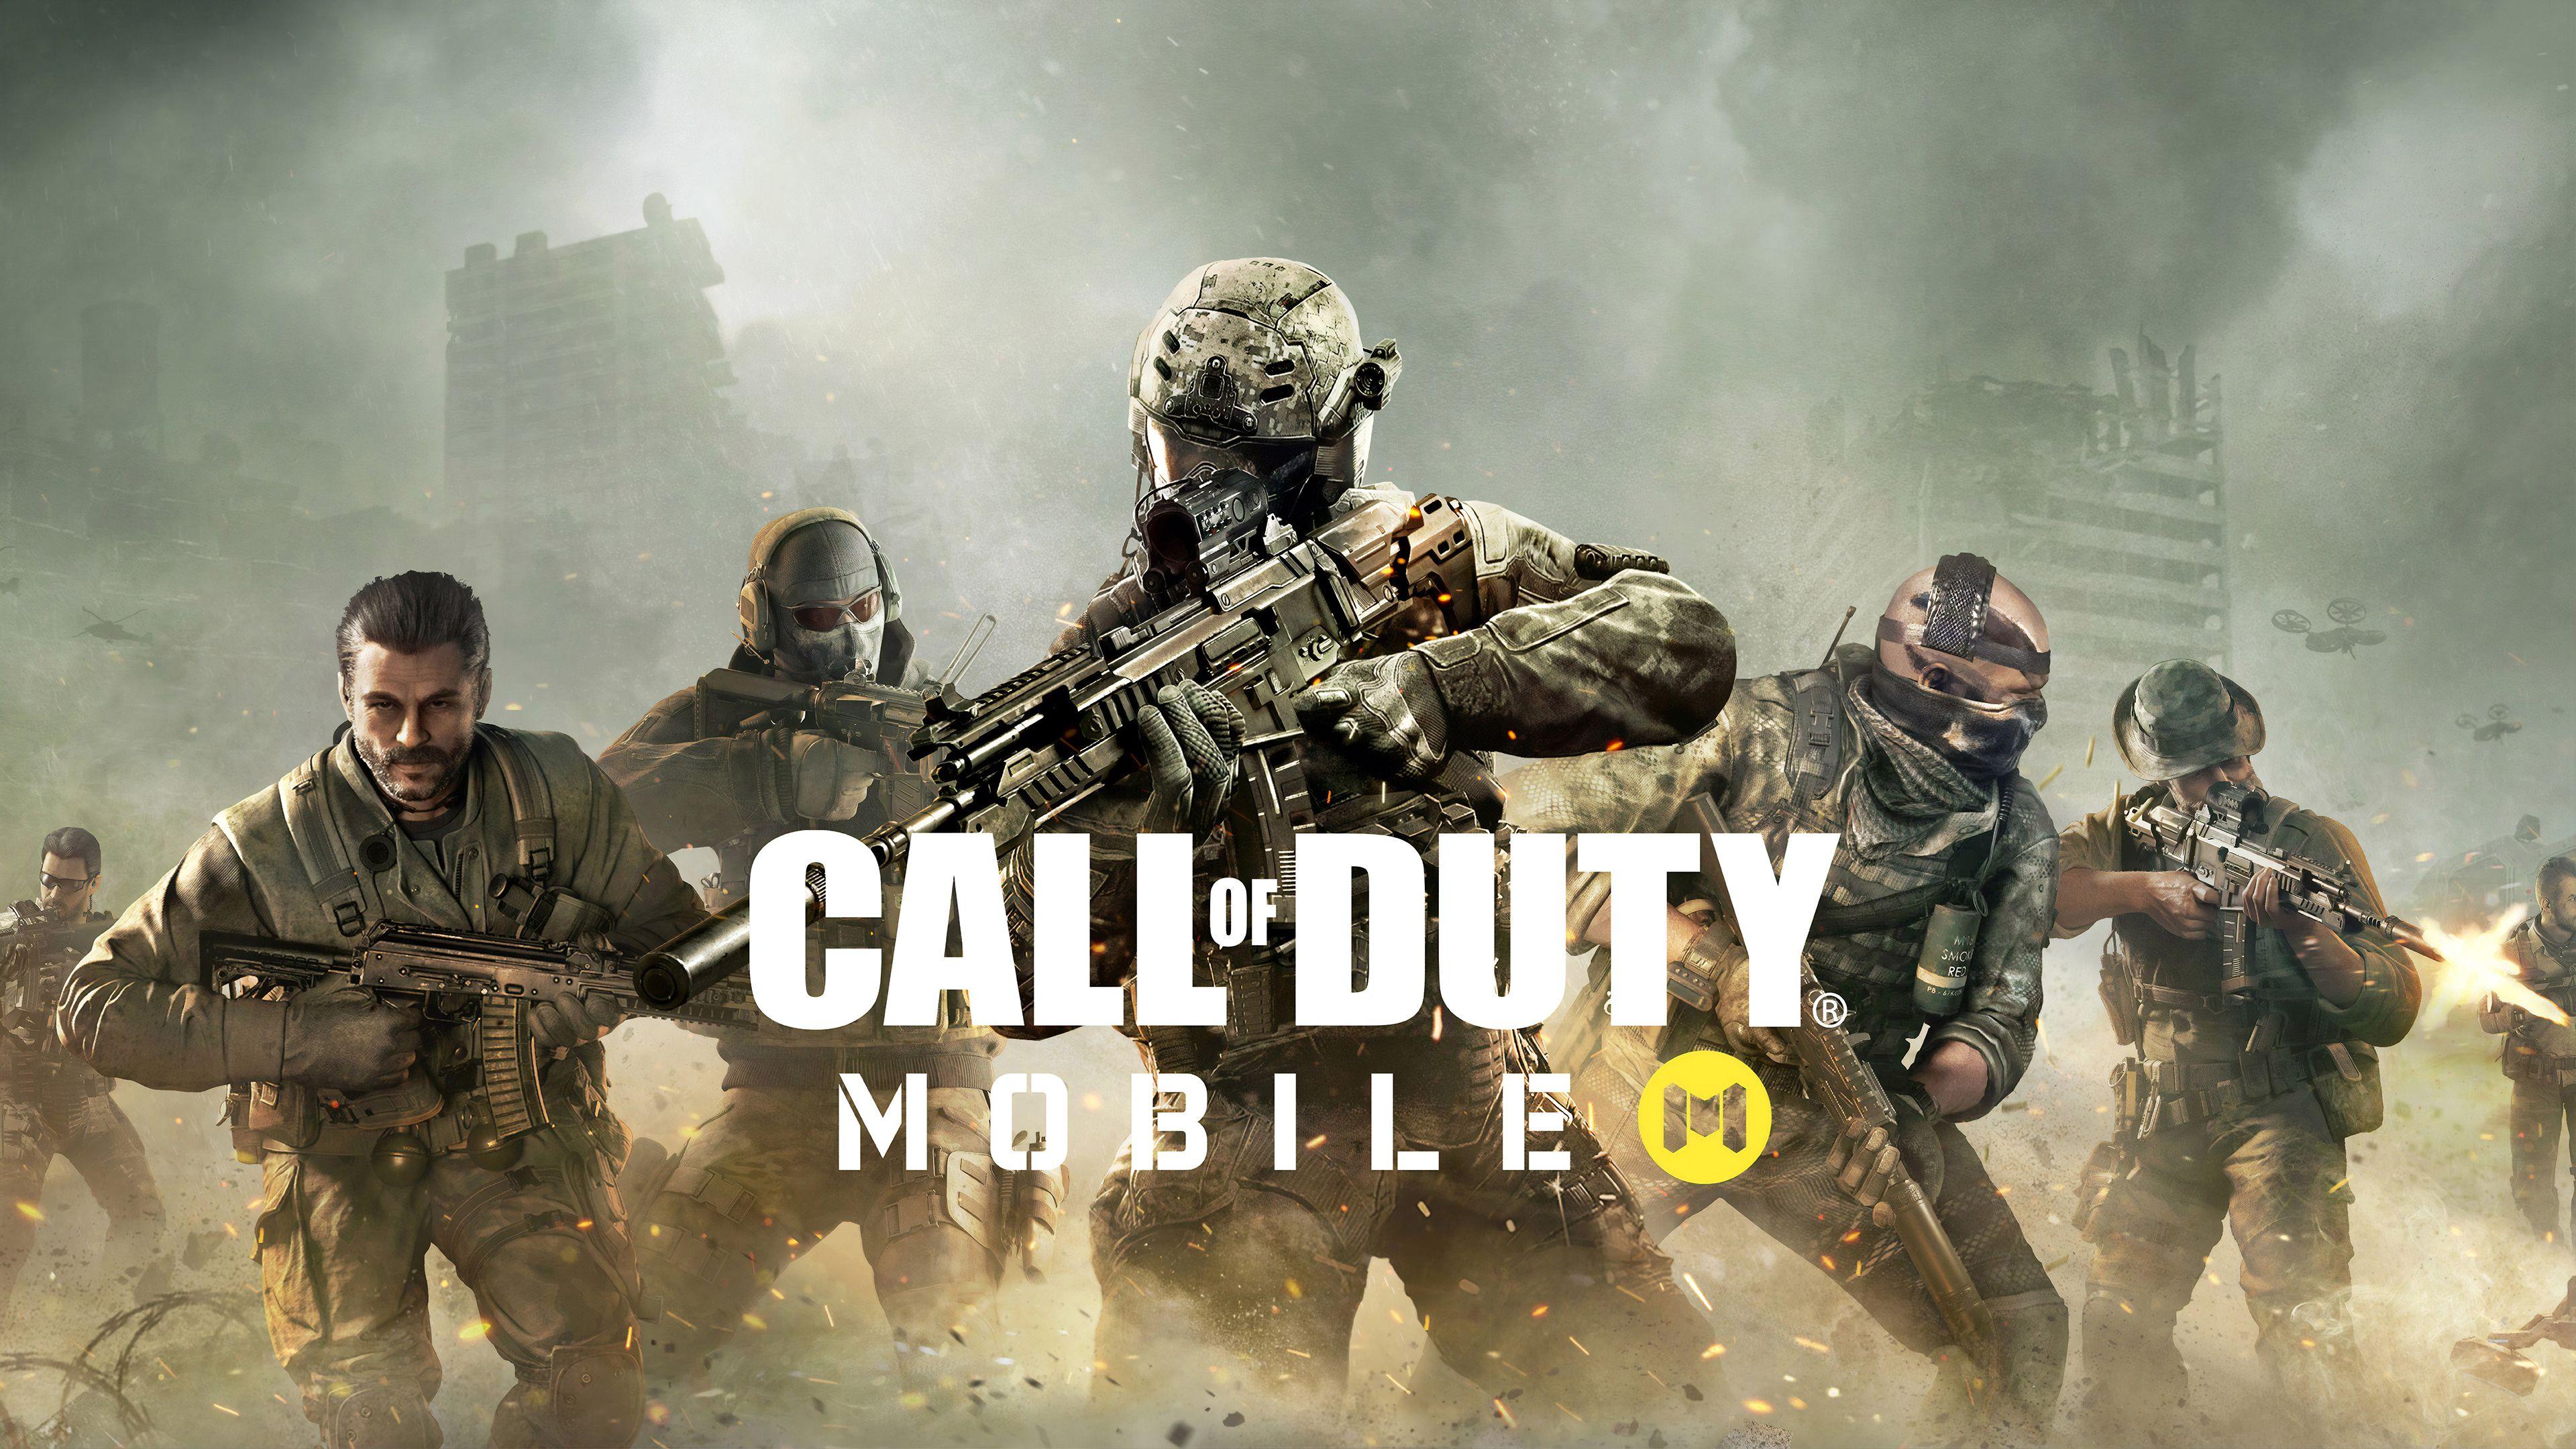 Call Of Duty Infinite Warfare Wallpapers TrumpWallpapers 3840x2160